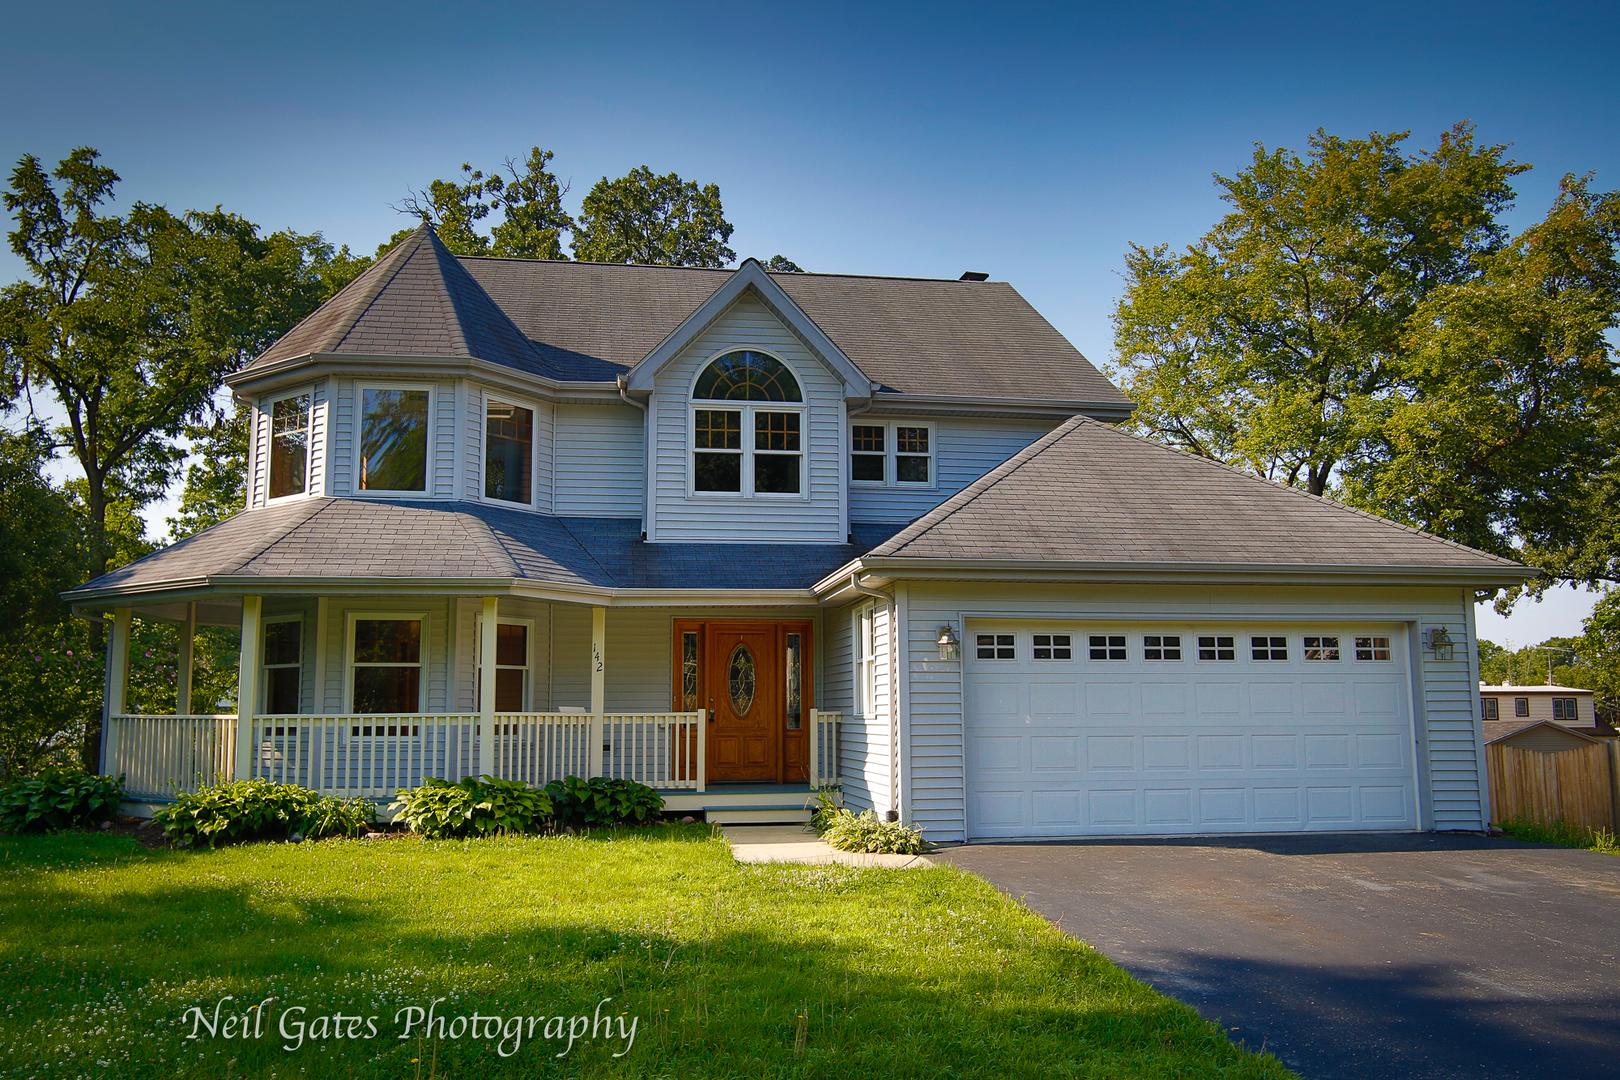 homes for sale in new lenox real estate in new lenox. Black Bedroom Furniture Sets. Home Design Ideas